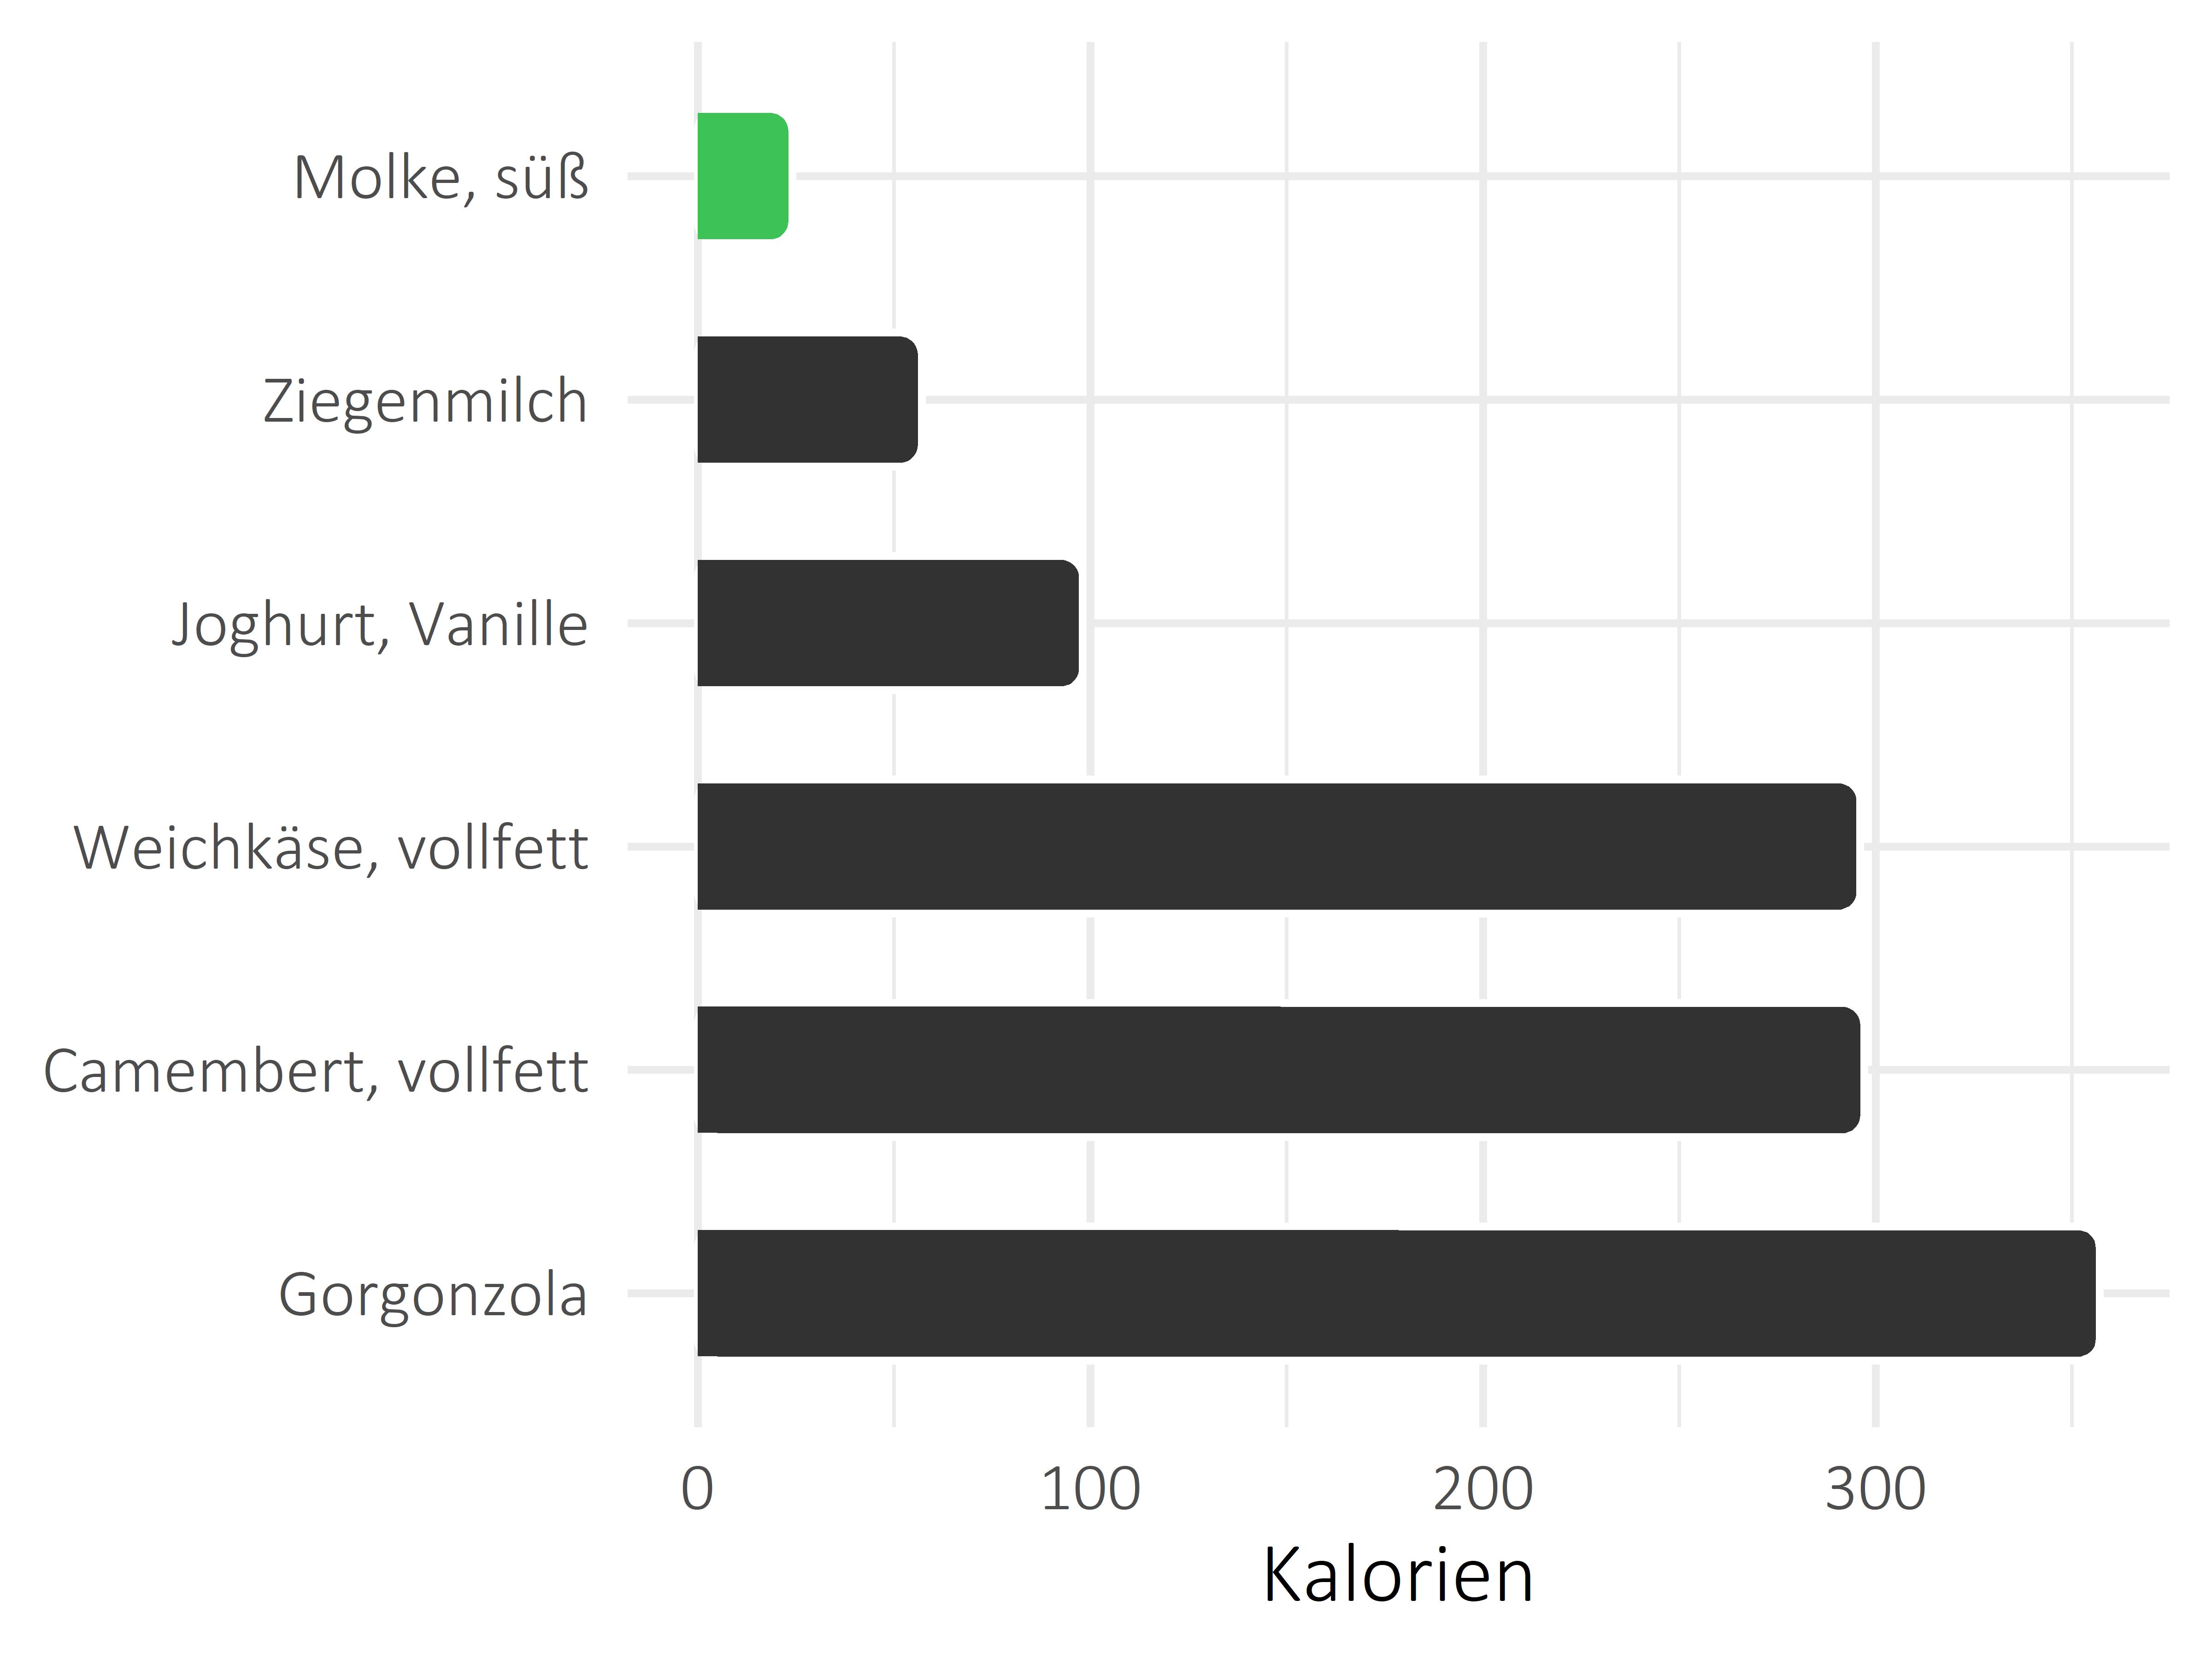 Milchprodukte Kalorien